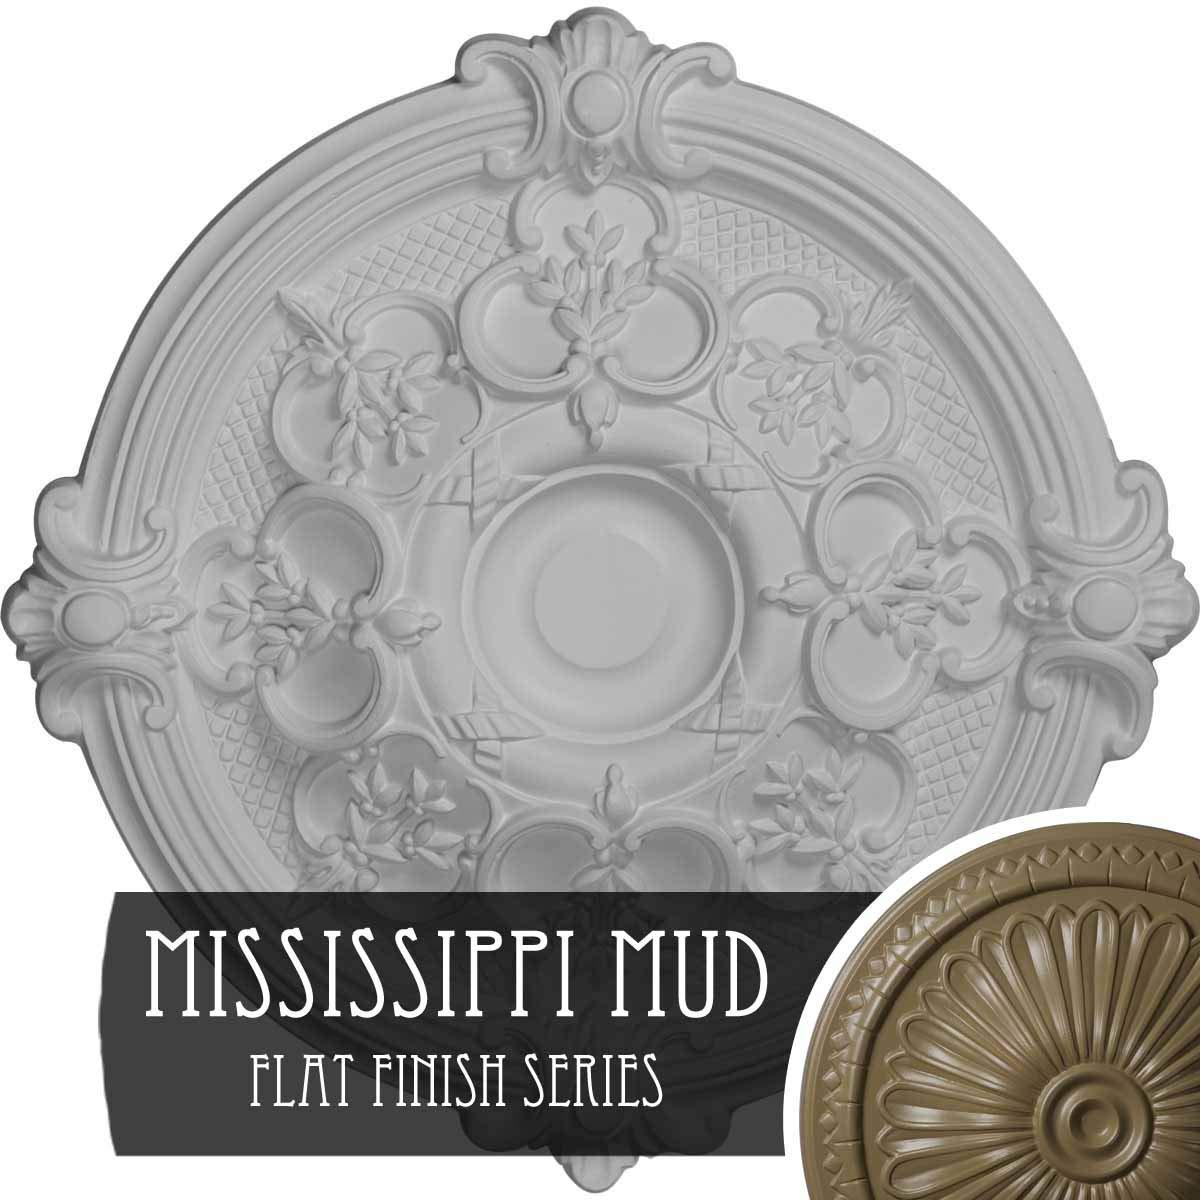 Ekena Millwork CM17HAMMF Hamilton Ceiling Medallion Fits Canopies Up to 3 3/4'', Mississippi Mud